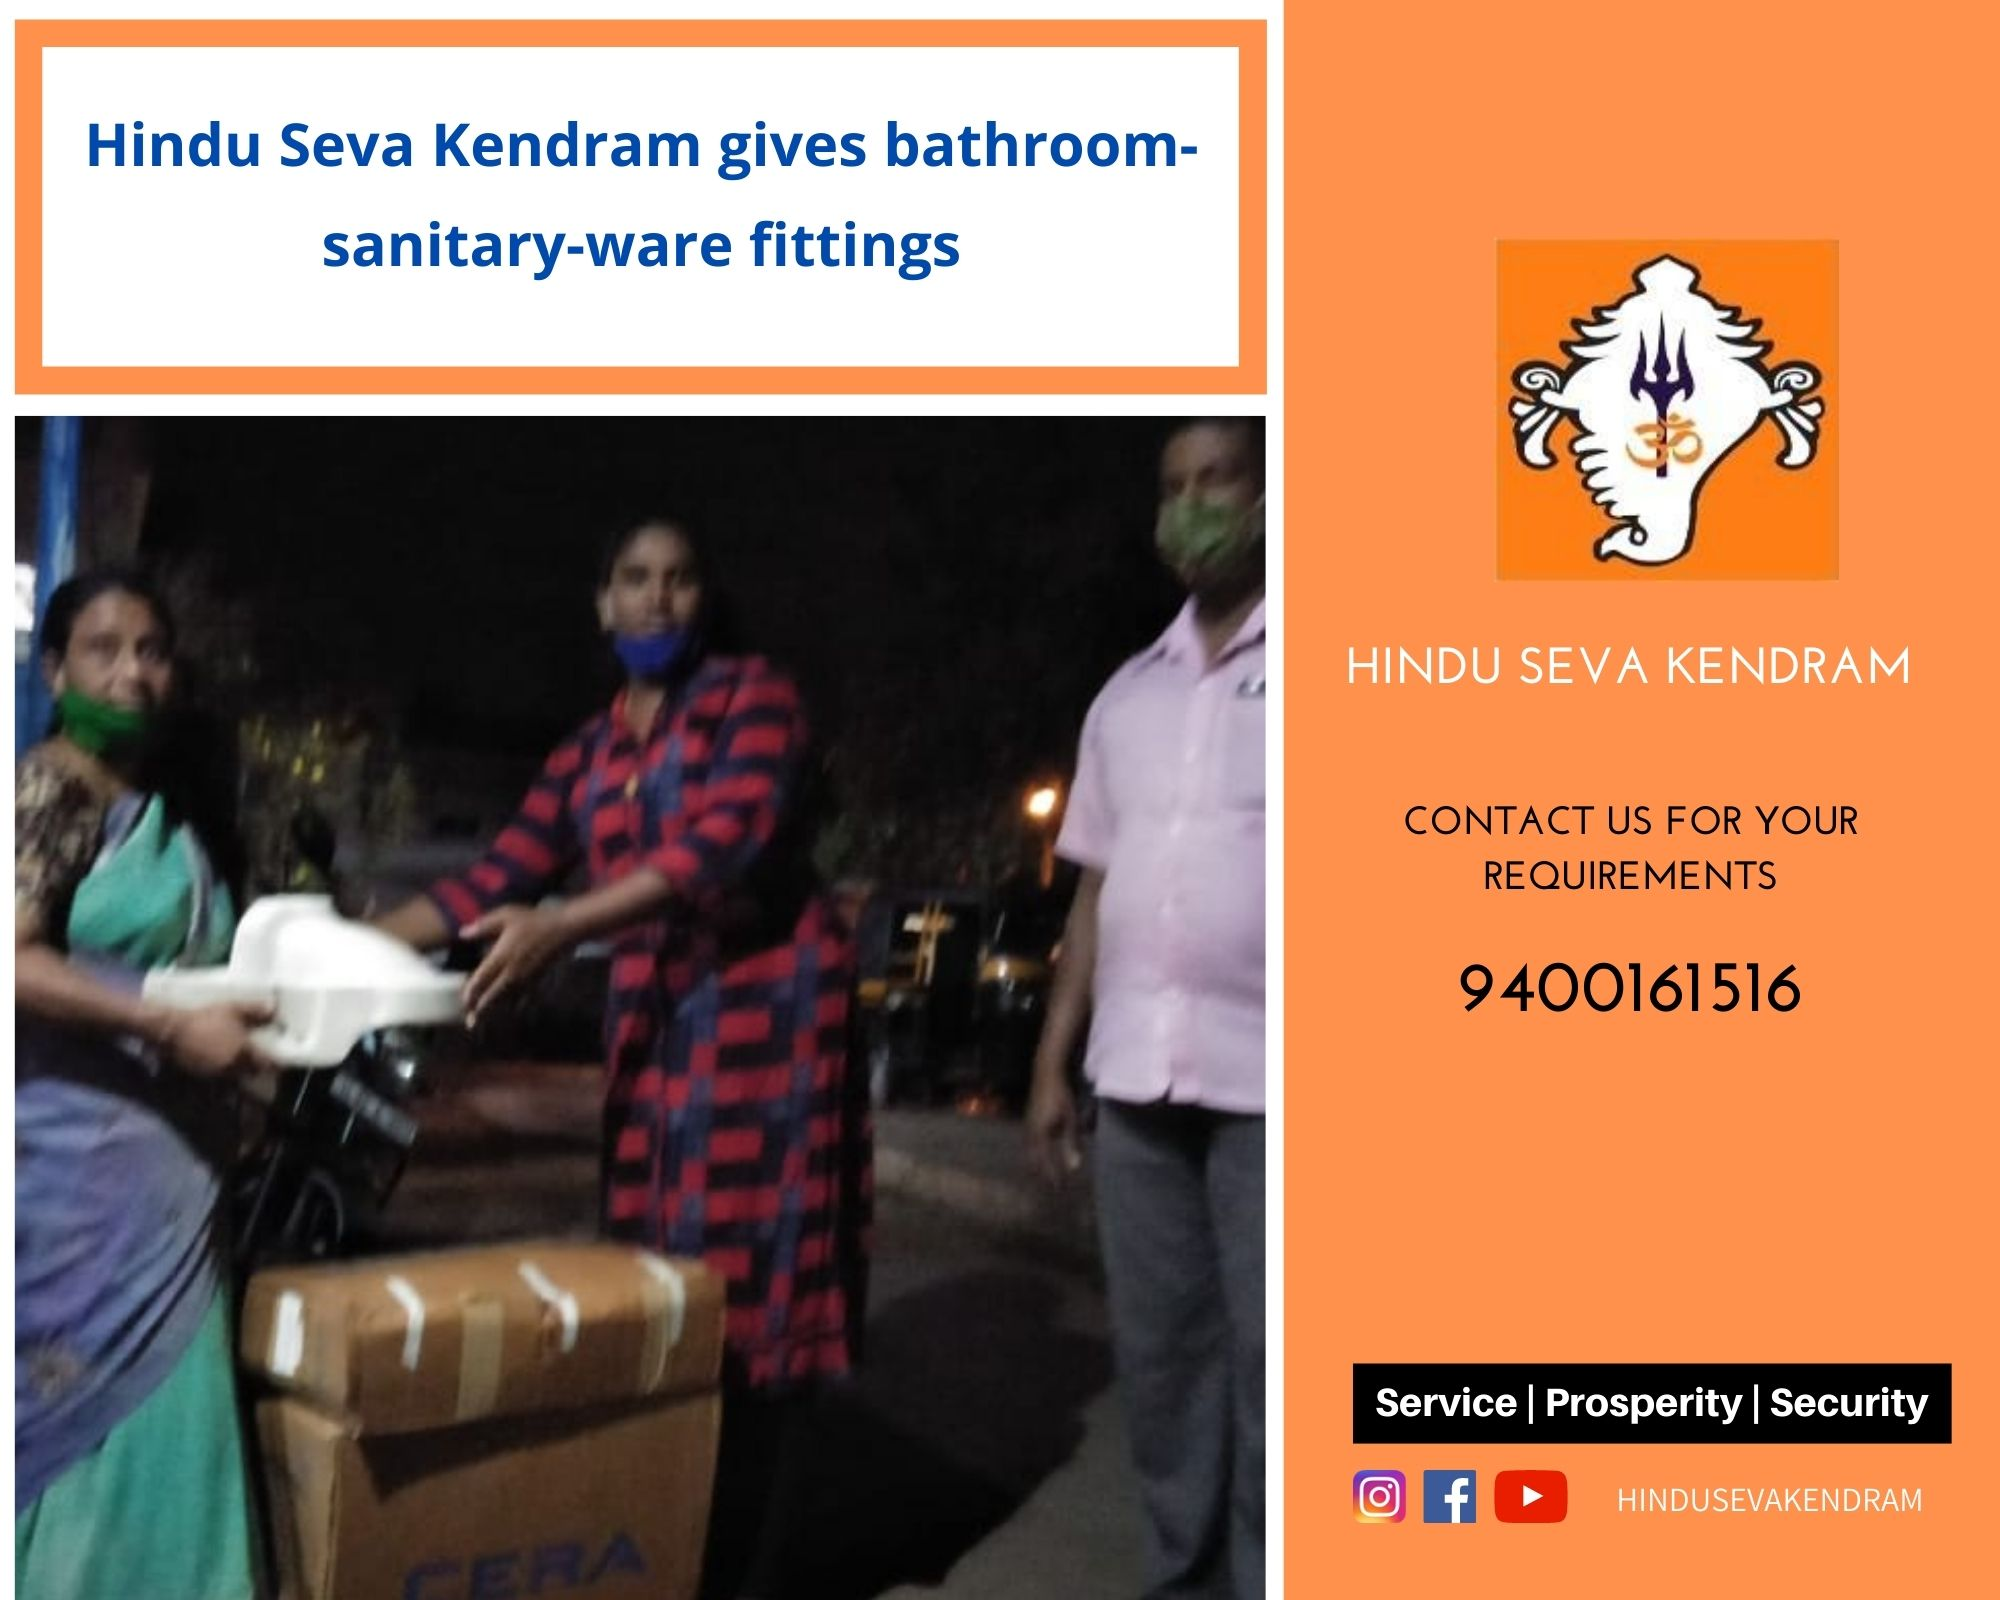 Hindu Seva Kendram gives bathroom-sanitary-ware fittings